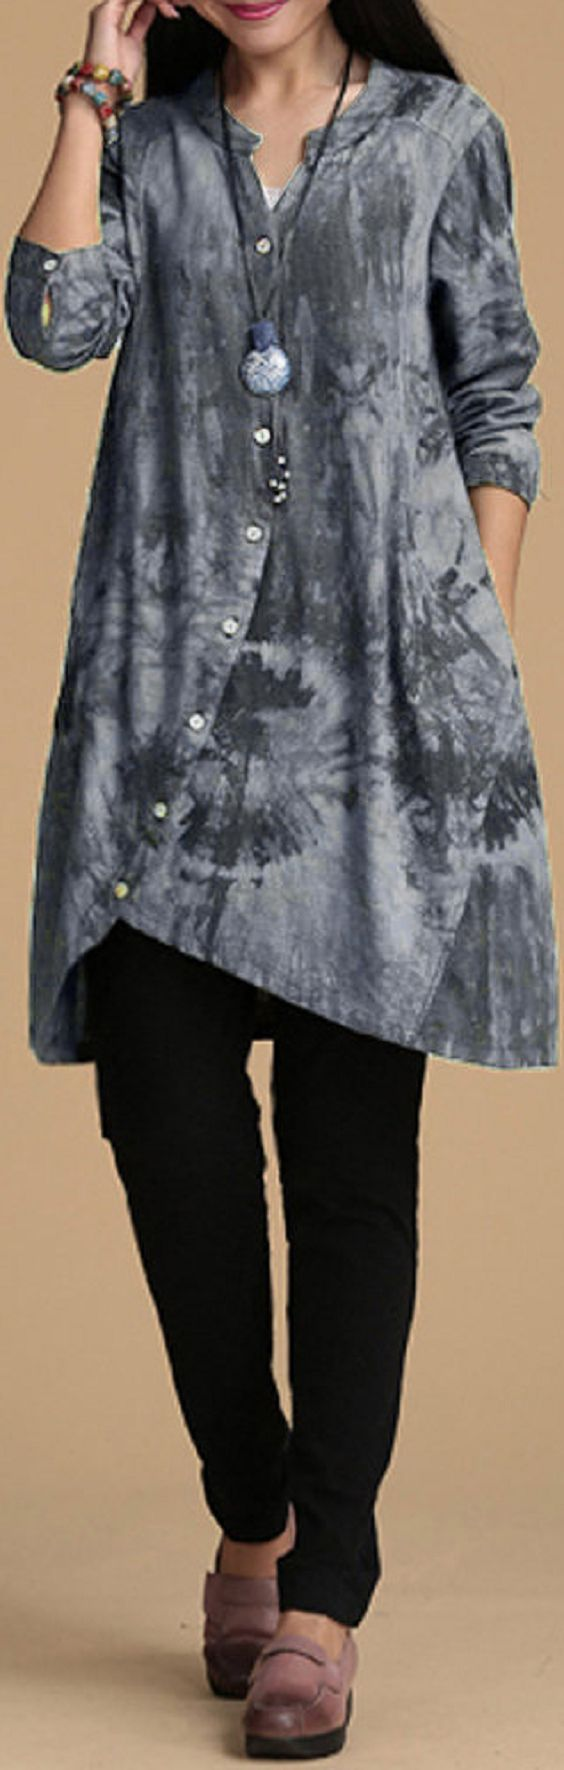 US$22.97 O-NEWE Women Vintage Printing V Neck Button Irregular Blouse